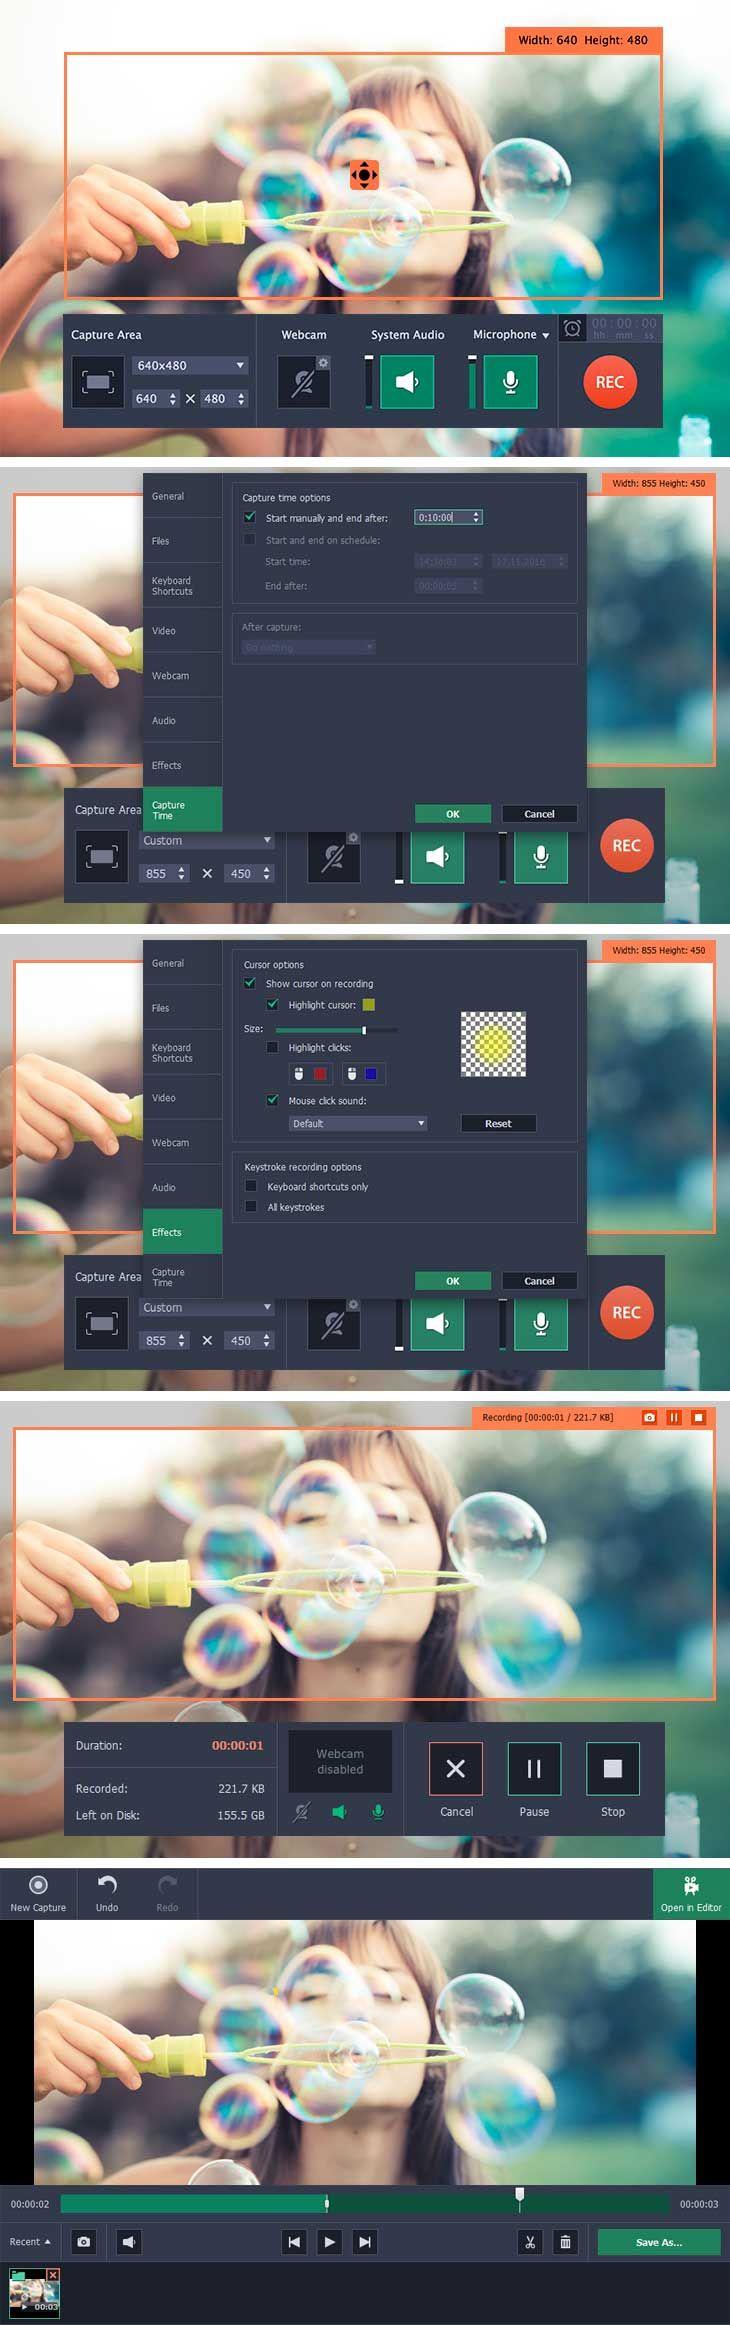 Movavi Screen Recorder 5.1.1 for Mac 破解版 – 多功能视频编辑软件 | Digit77.com | 海量精品Mac应用下载 | Wordpress主题商店